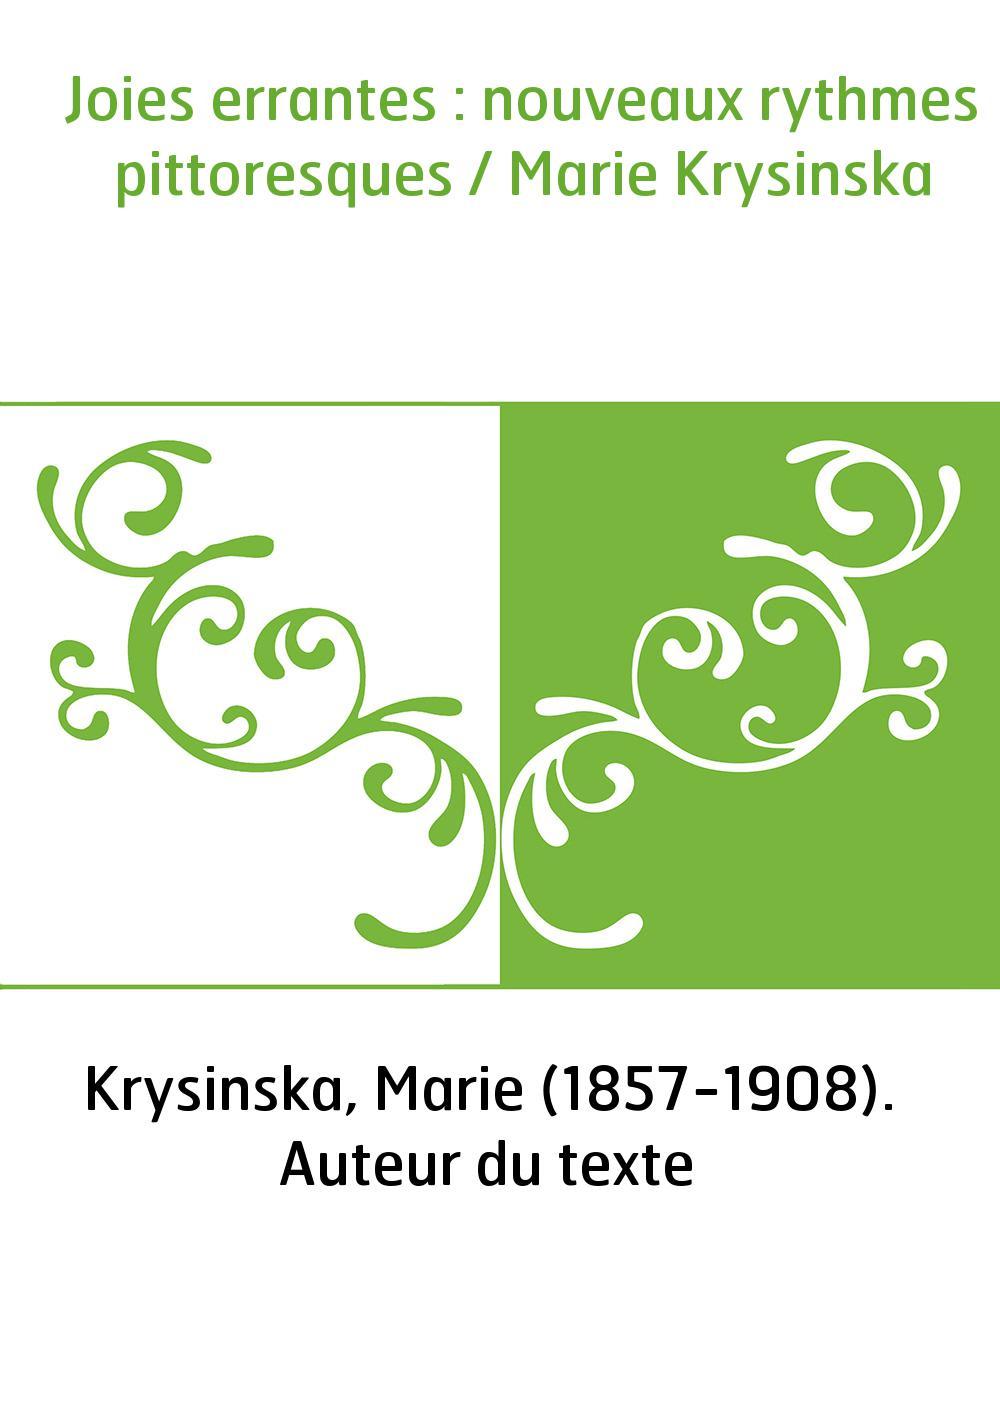 Joies errantes : nouveaux rythmes pittoresques / Marie Krysinska